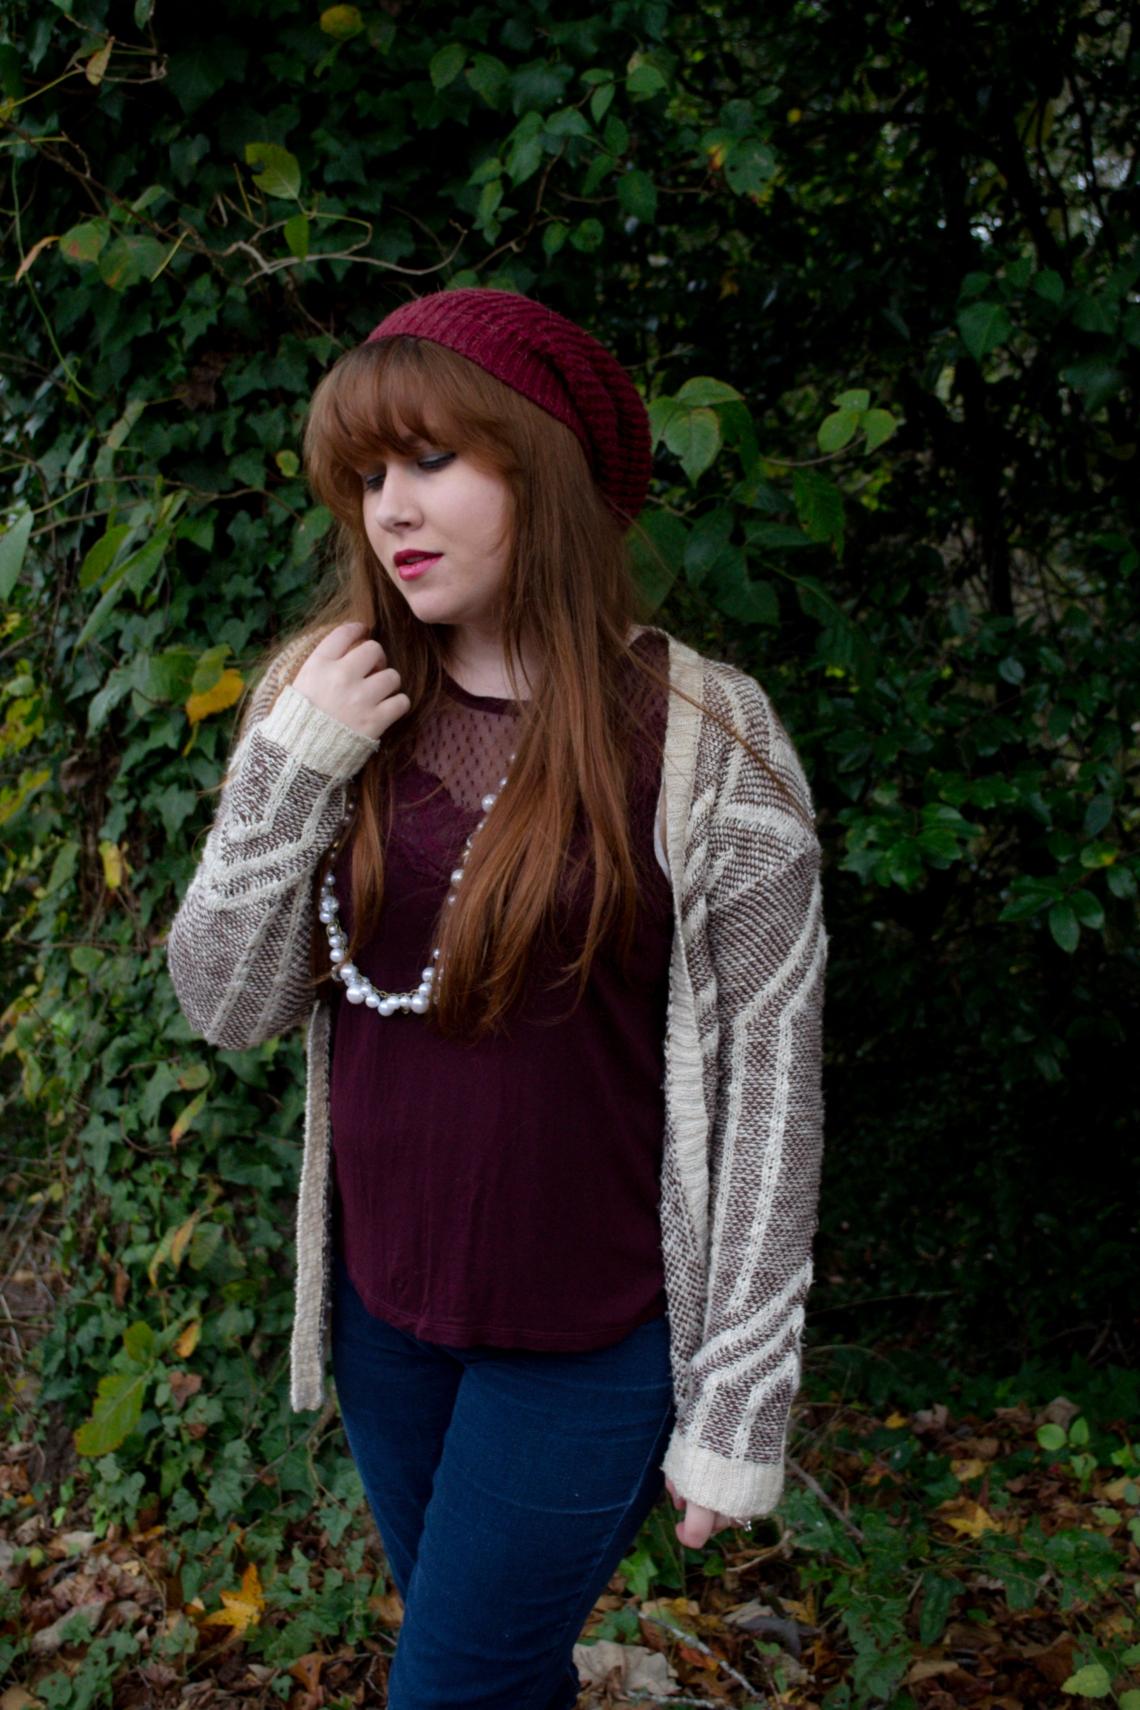 giftofgabby_sixbloggerstyle_november2017_knitwear-4